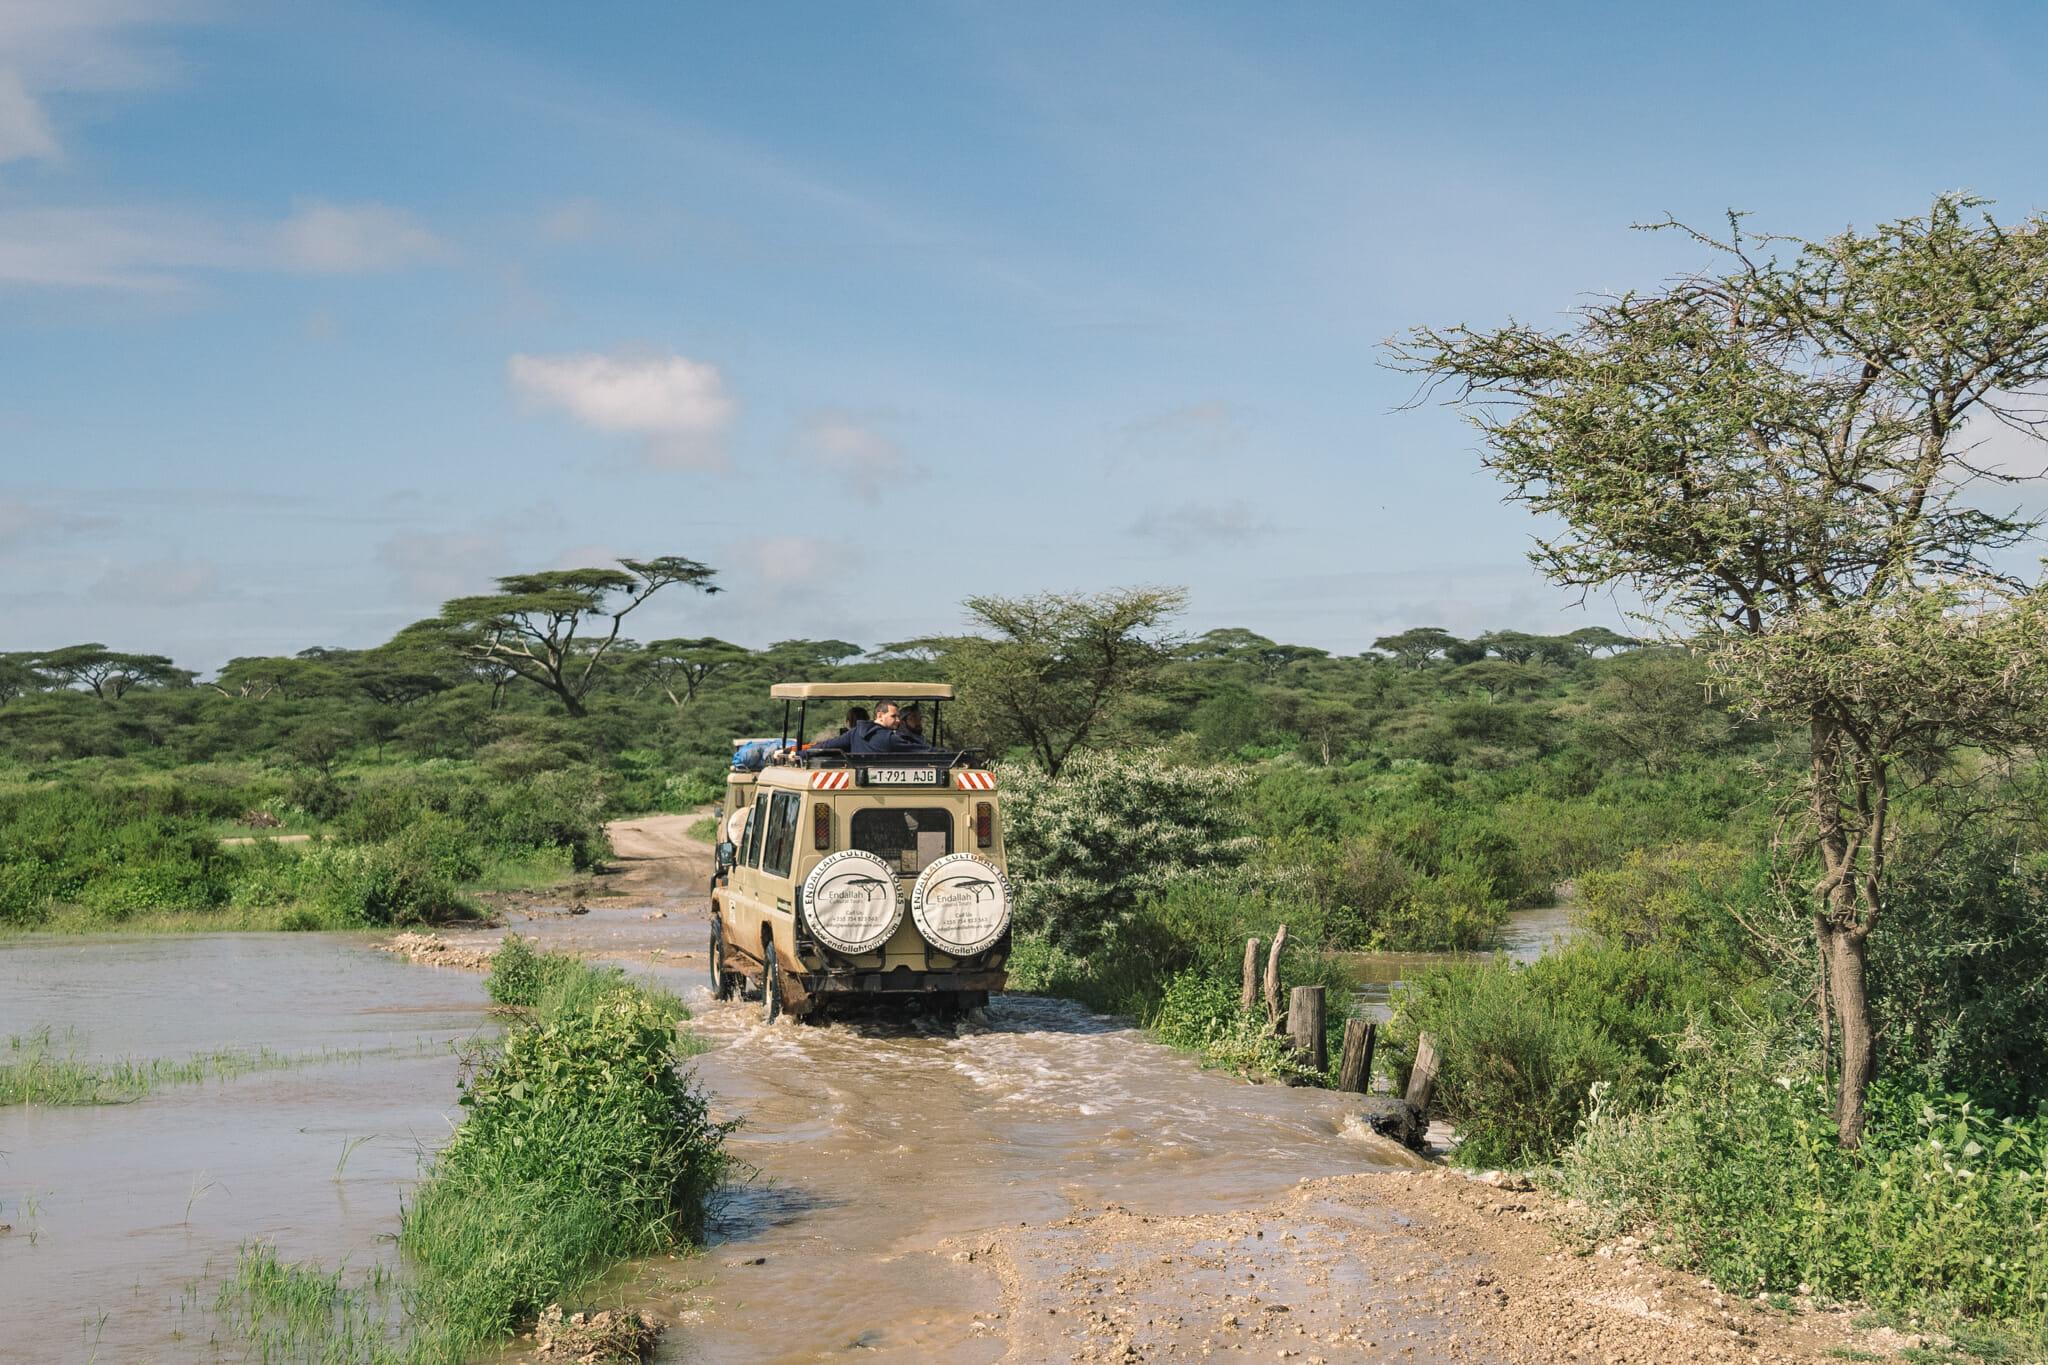 Endallah, agence de voyage engagée en Tanzanie